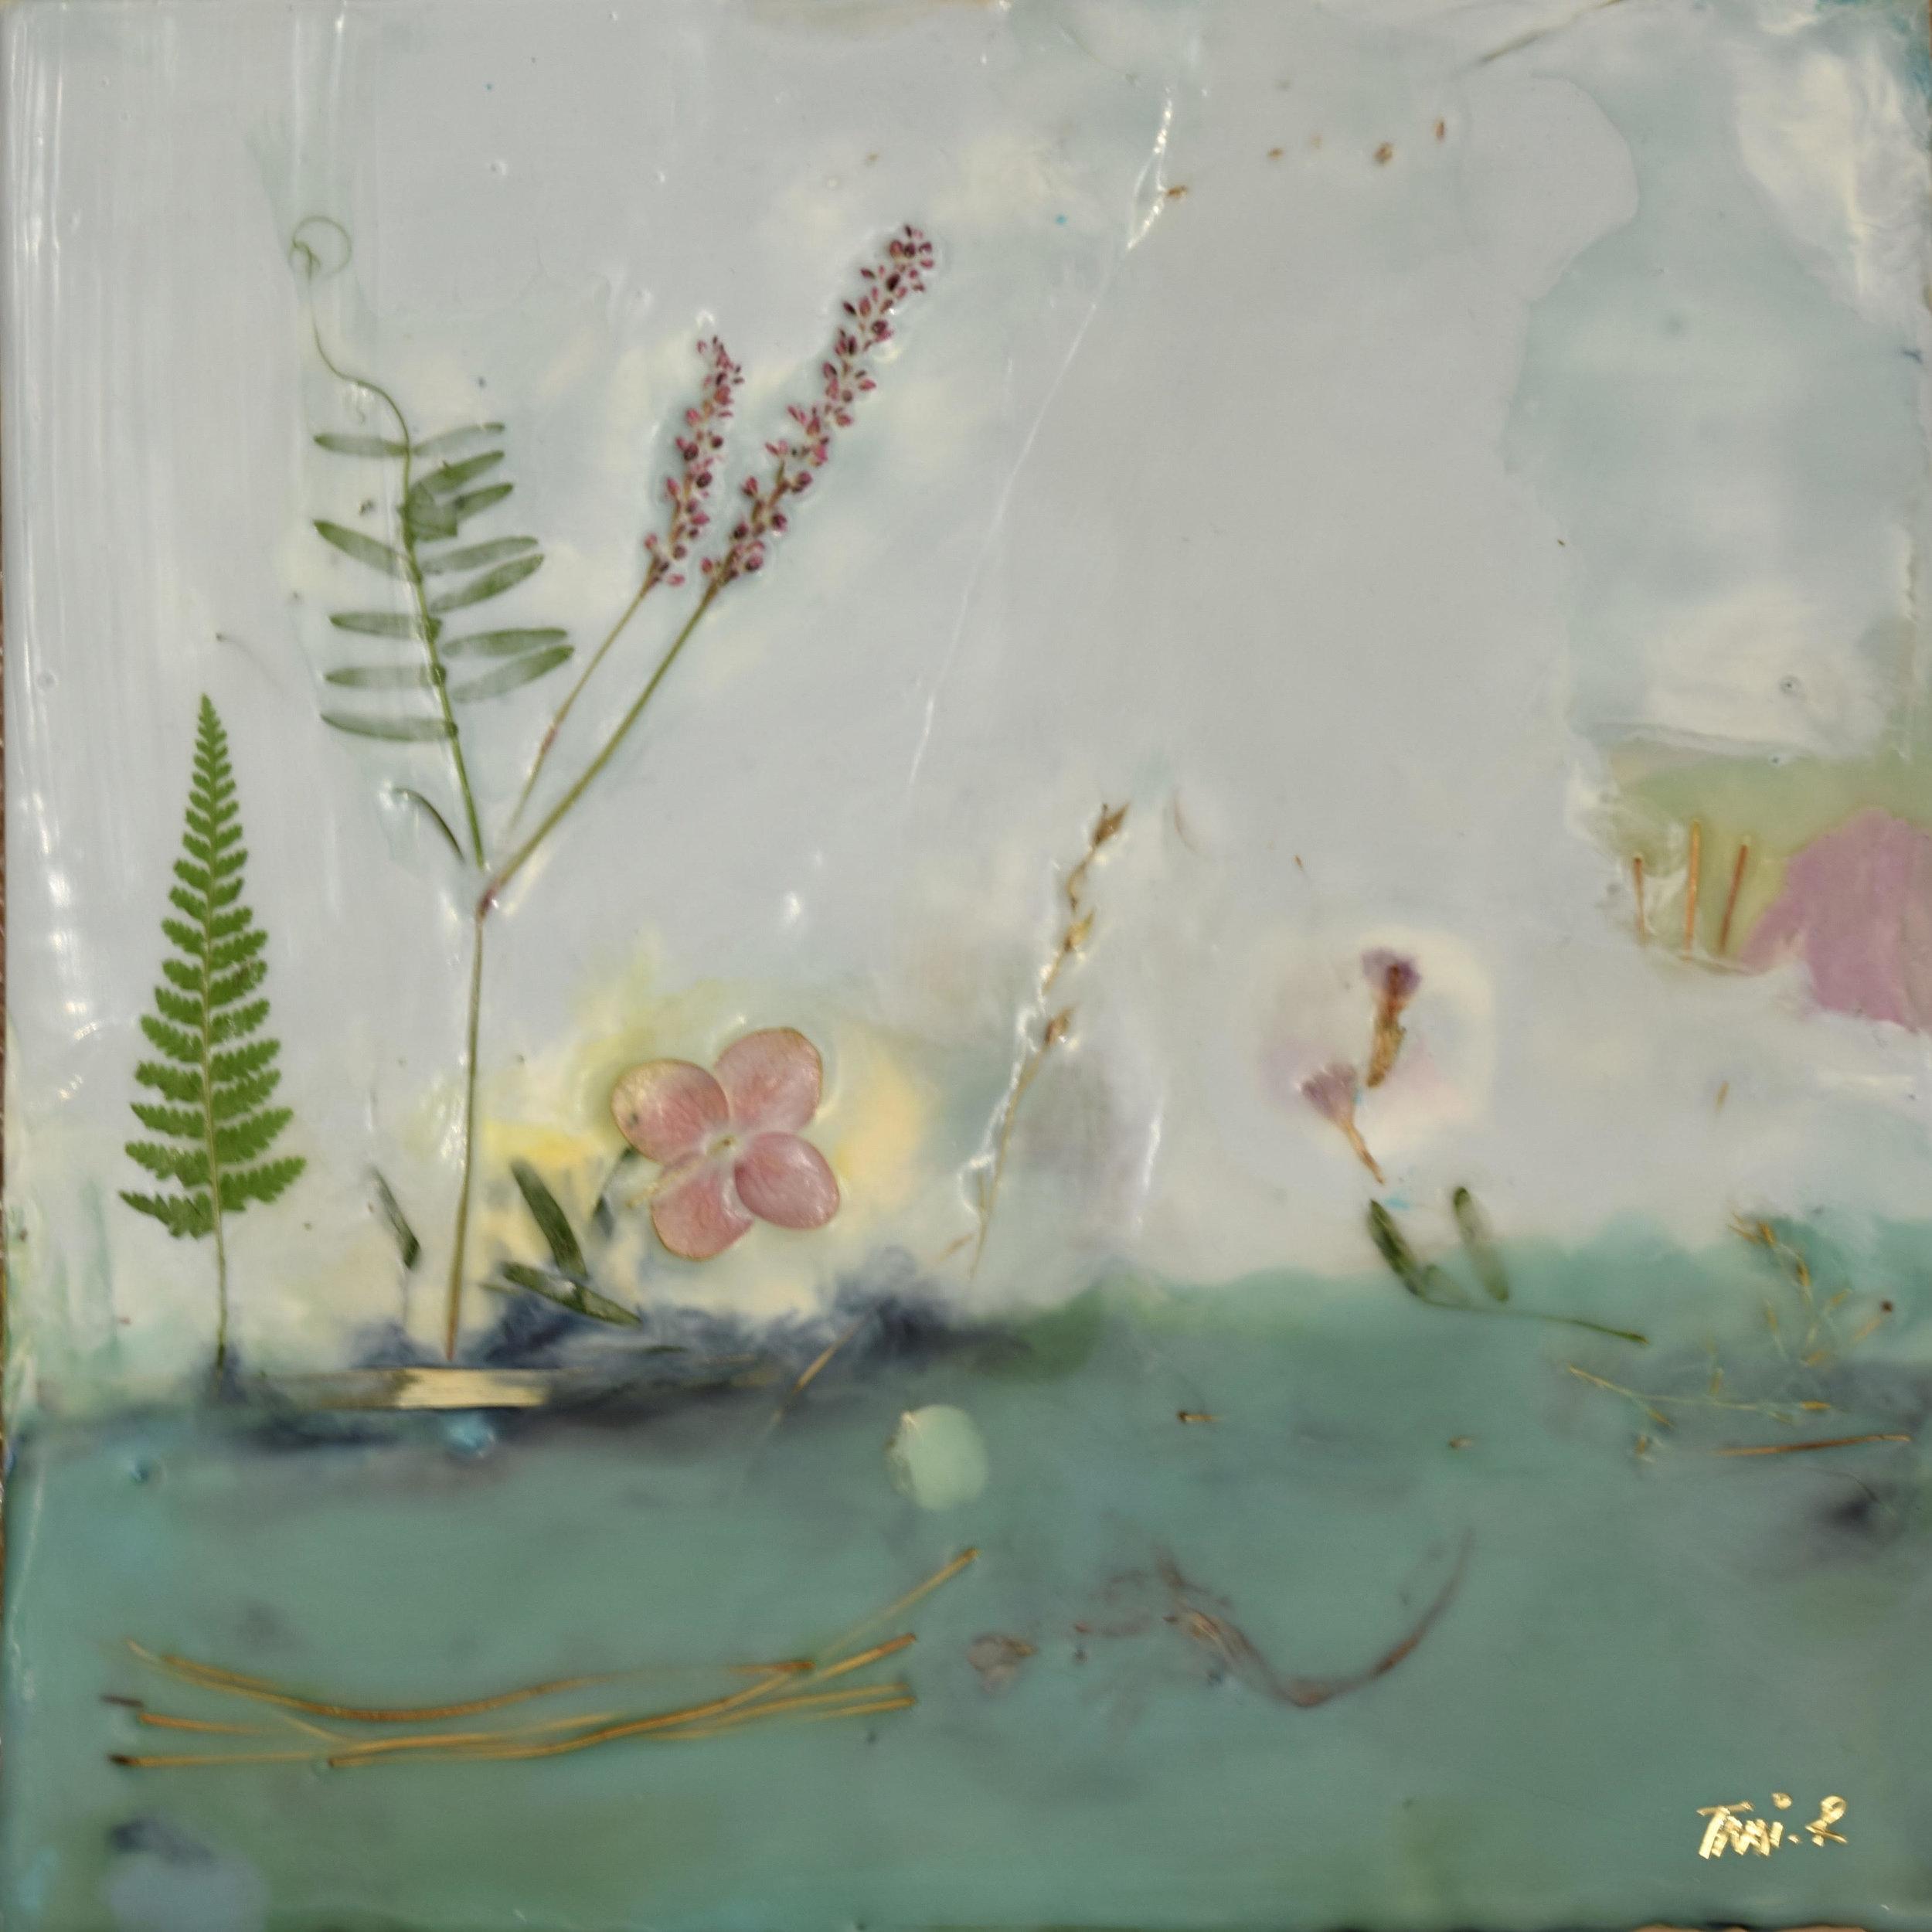 "Tami Rodrig,  Spring , encaustic, dried leaves and flowers on panel, 8"" x 8"", $250"